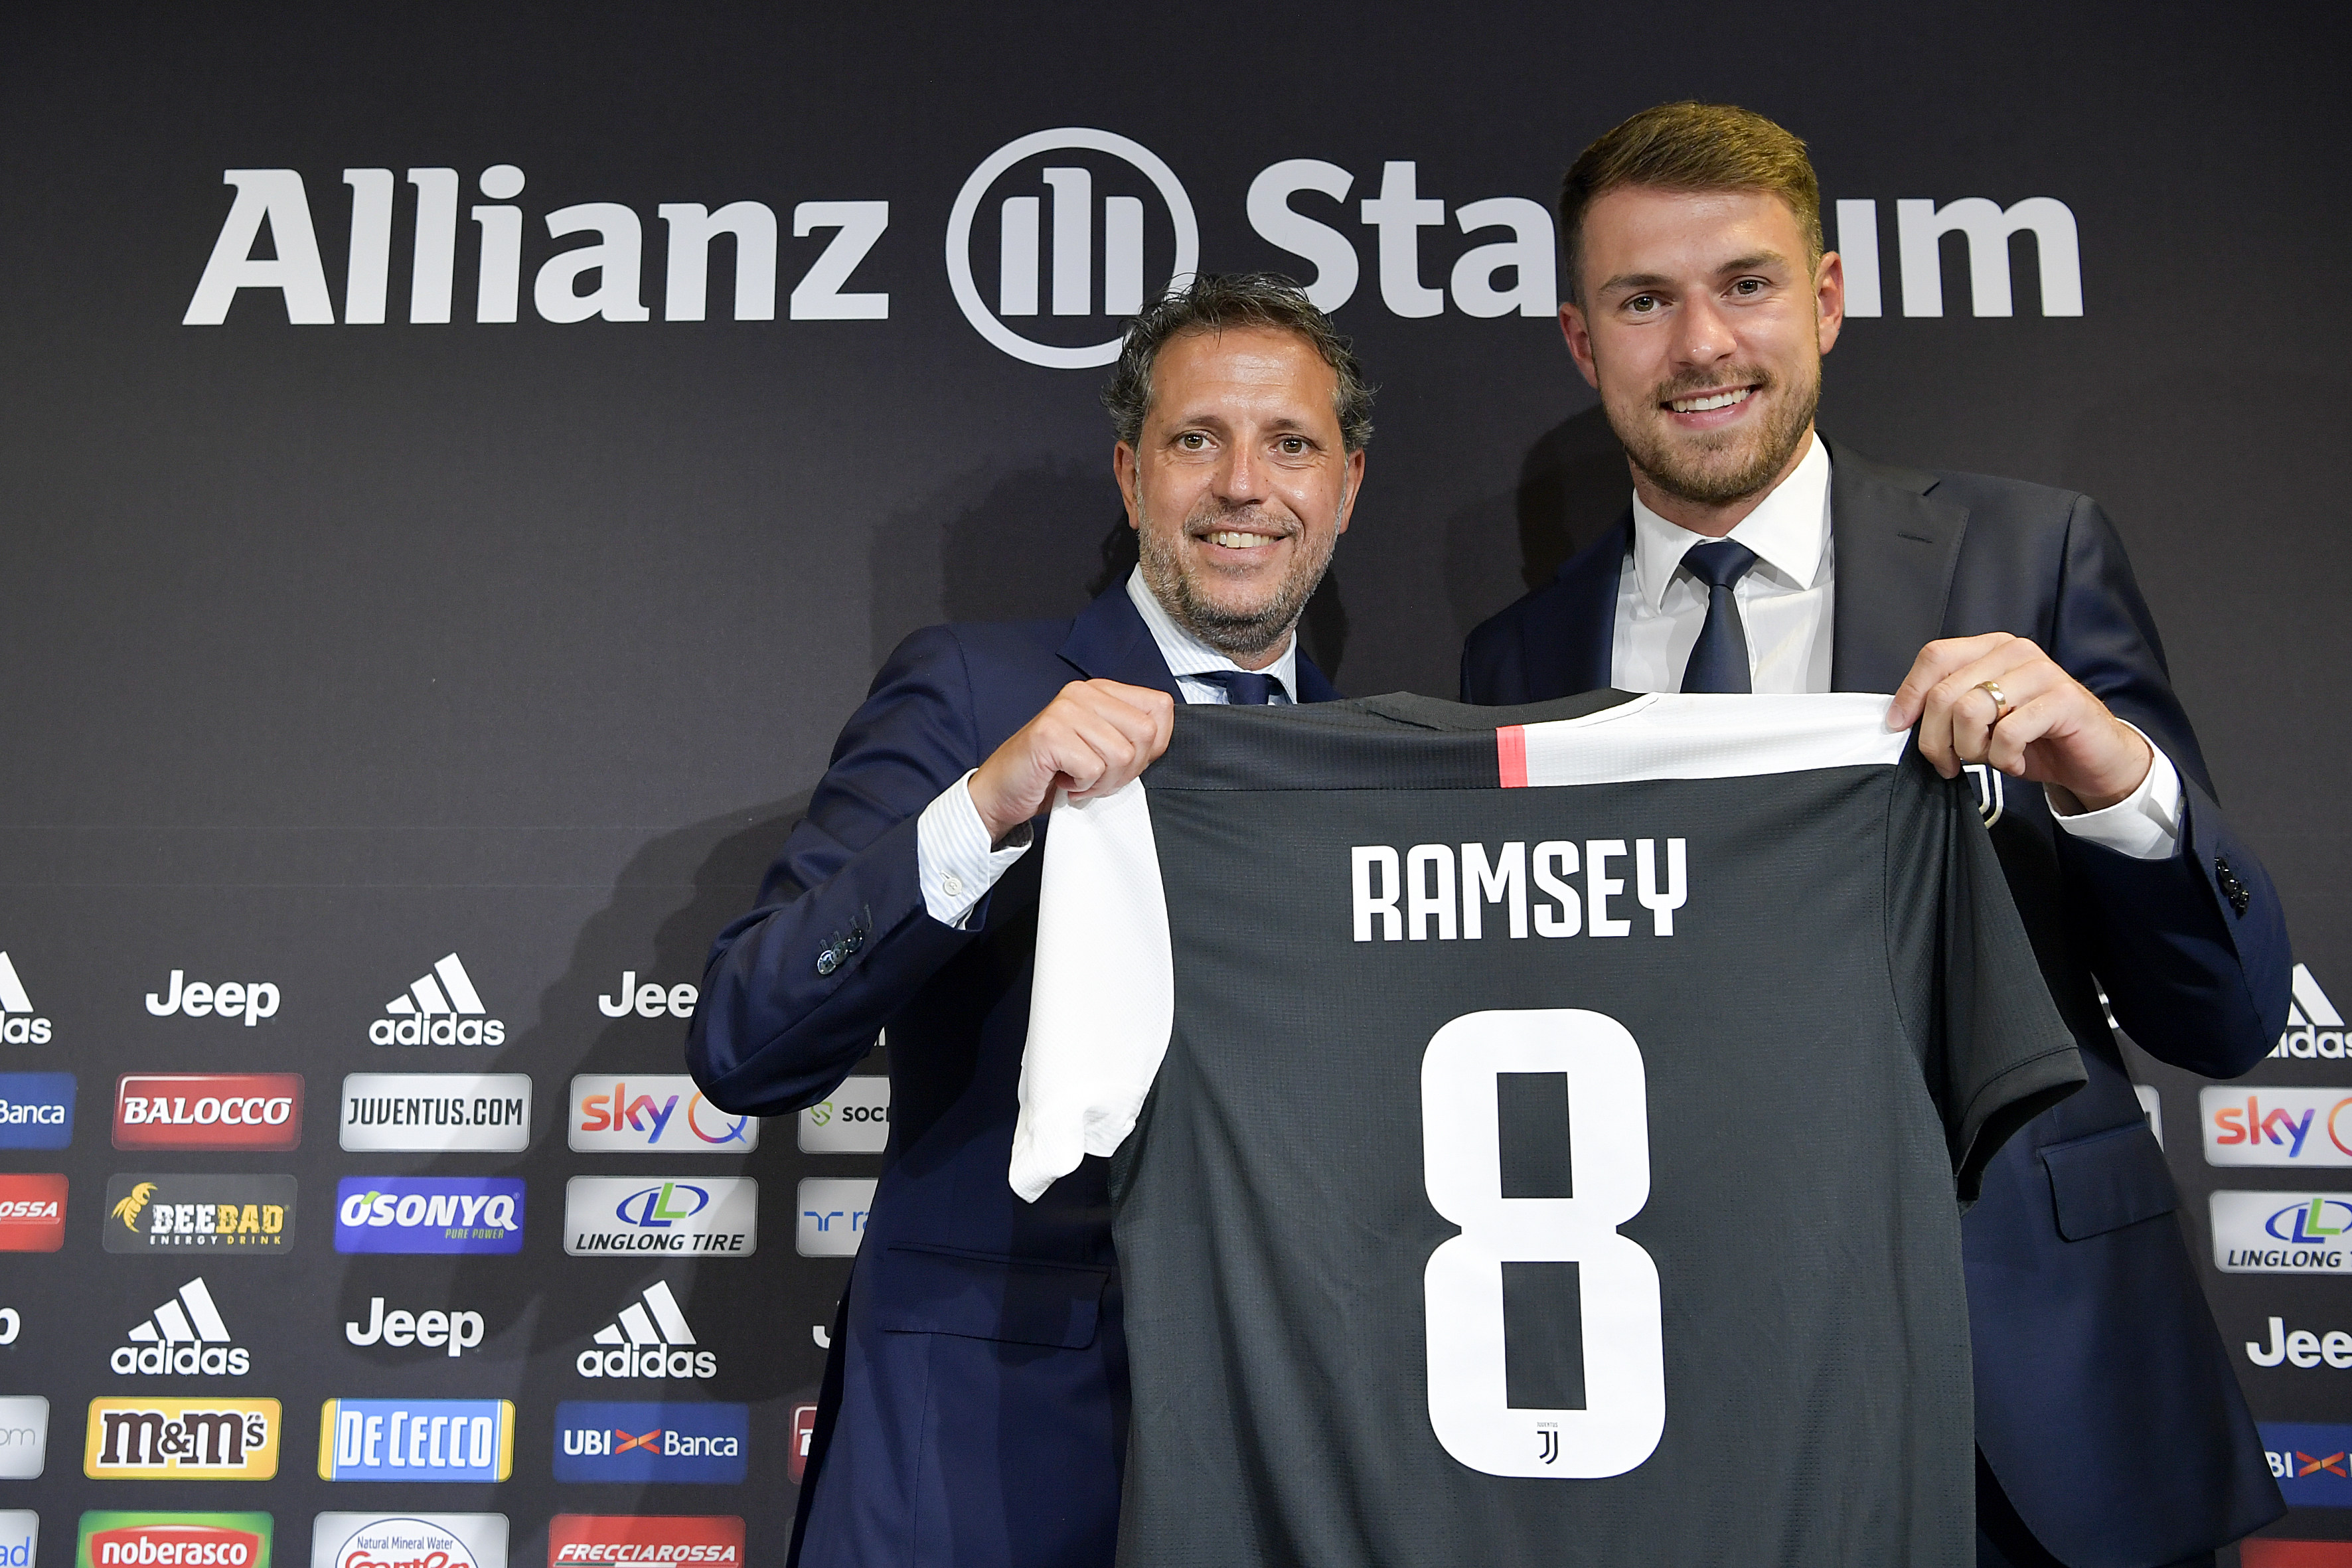 Juventus Player Aaron Ramsey Press Conference